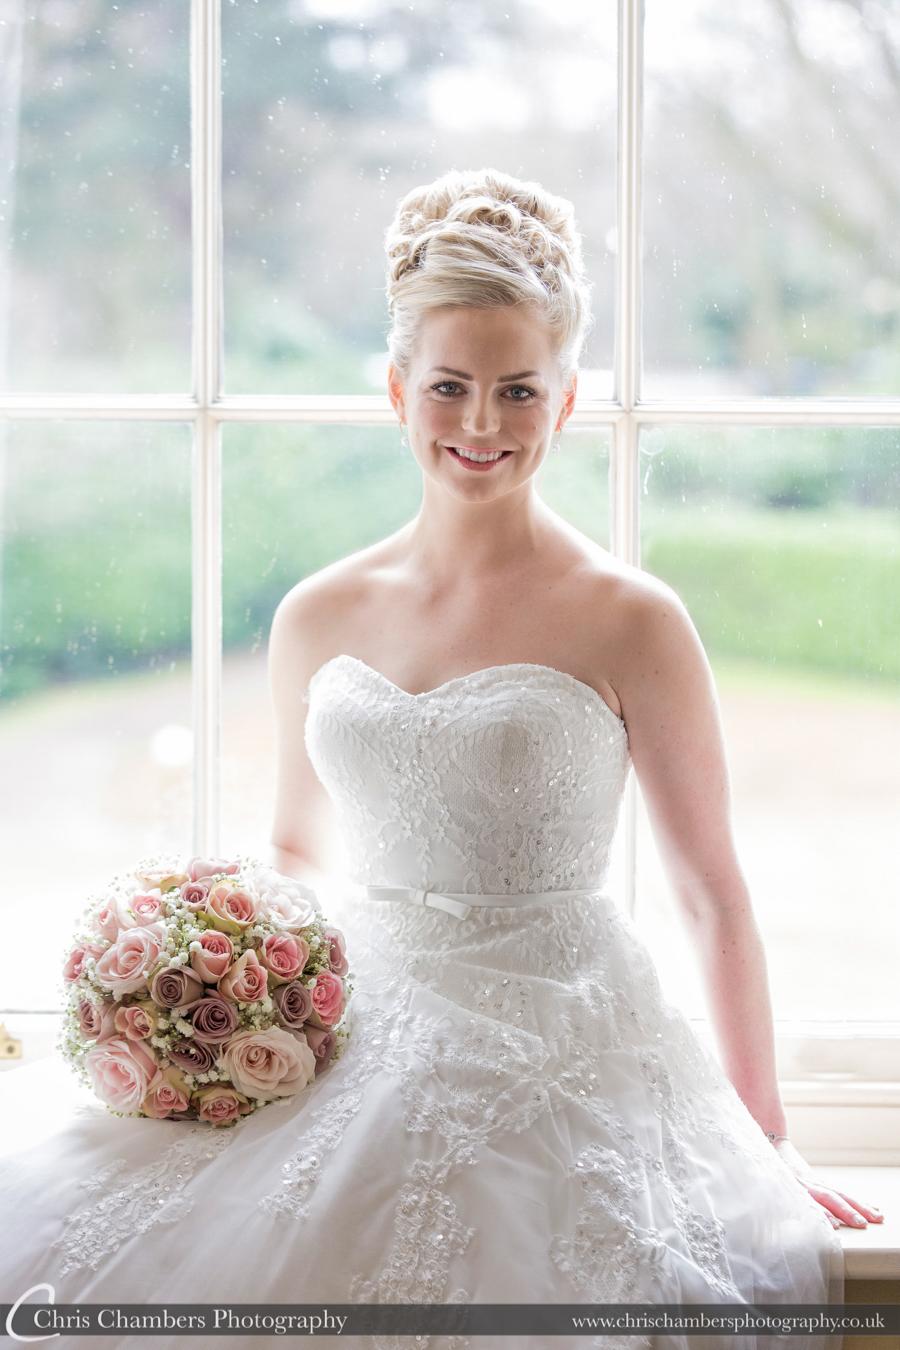 Yorkshire wedding photographer in Leeds, Award winning Oulton Hall wedding photography, West Yorkshire photographer, Leeds Wedding Photographer at Oulton Hall and Oulton Hall Wedding Photographer